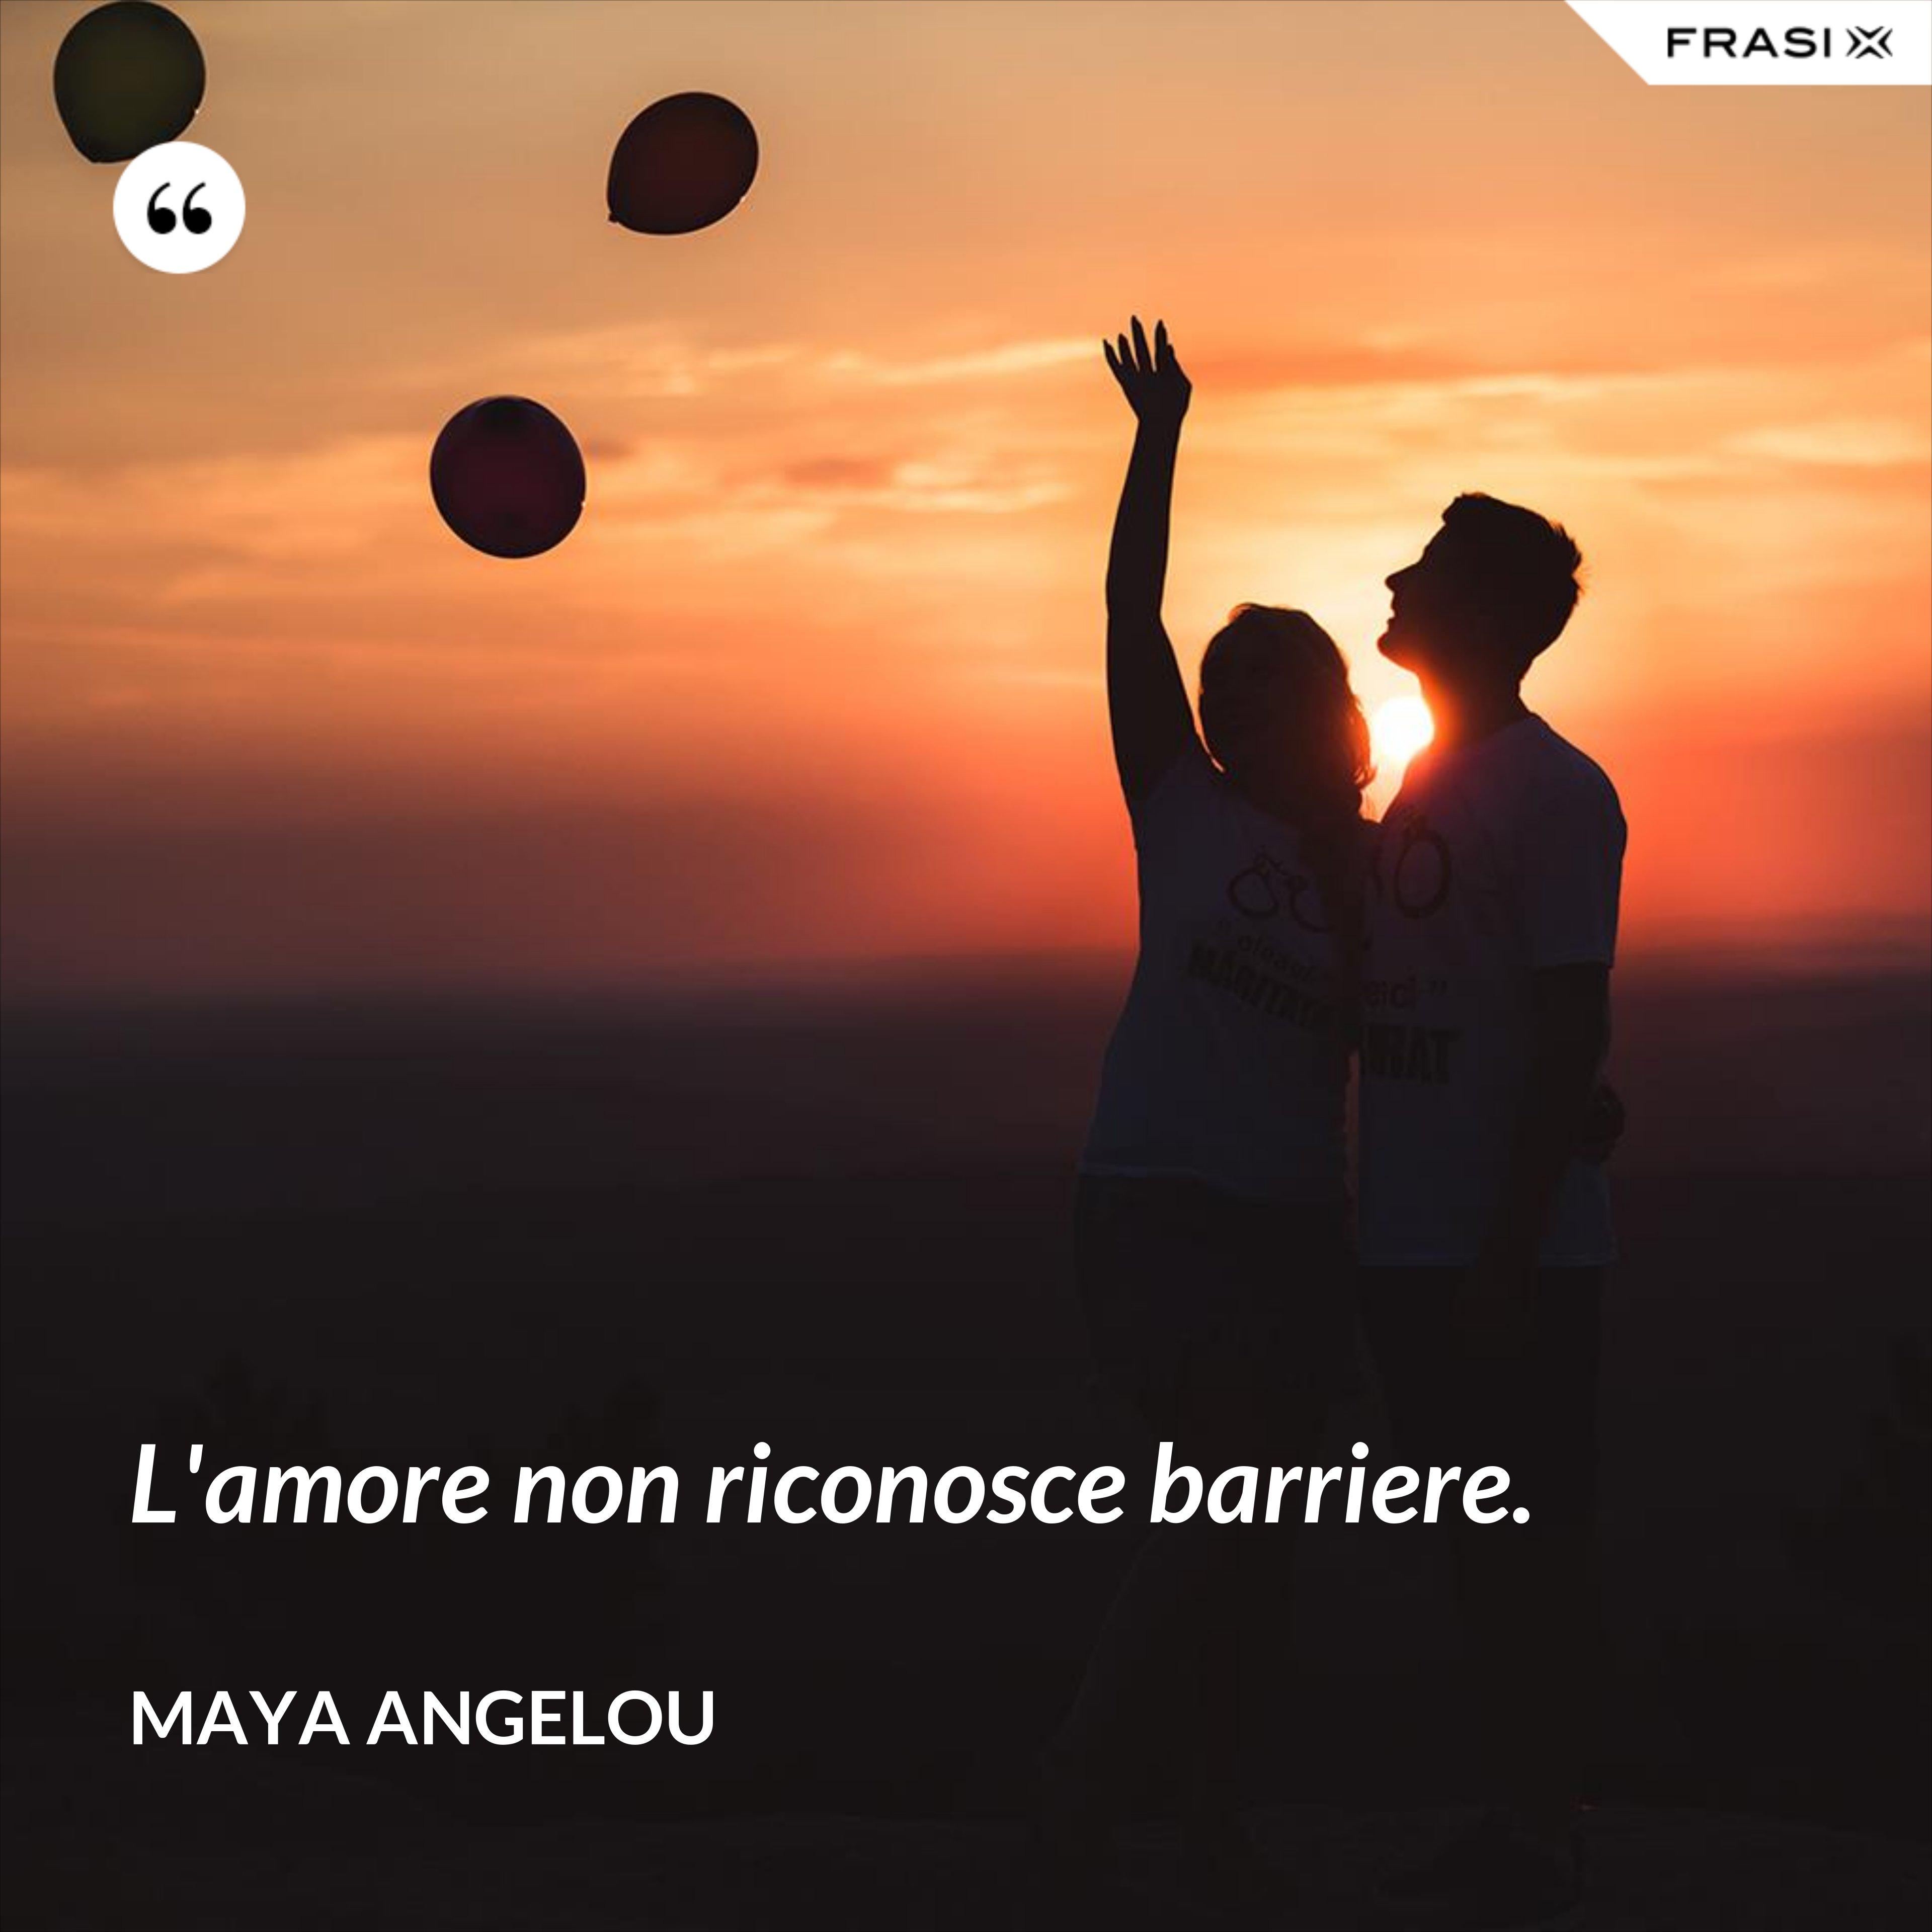 L'amore non riconosce barriere. - Maya Angelou